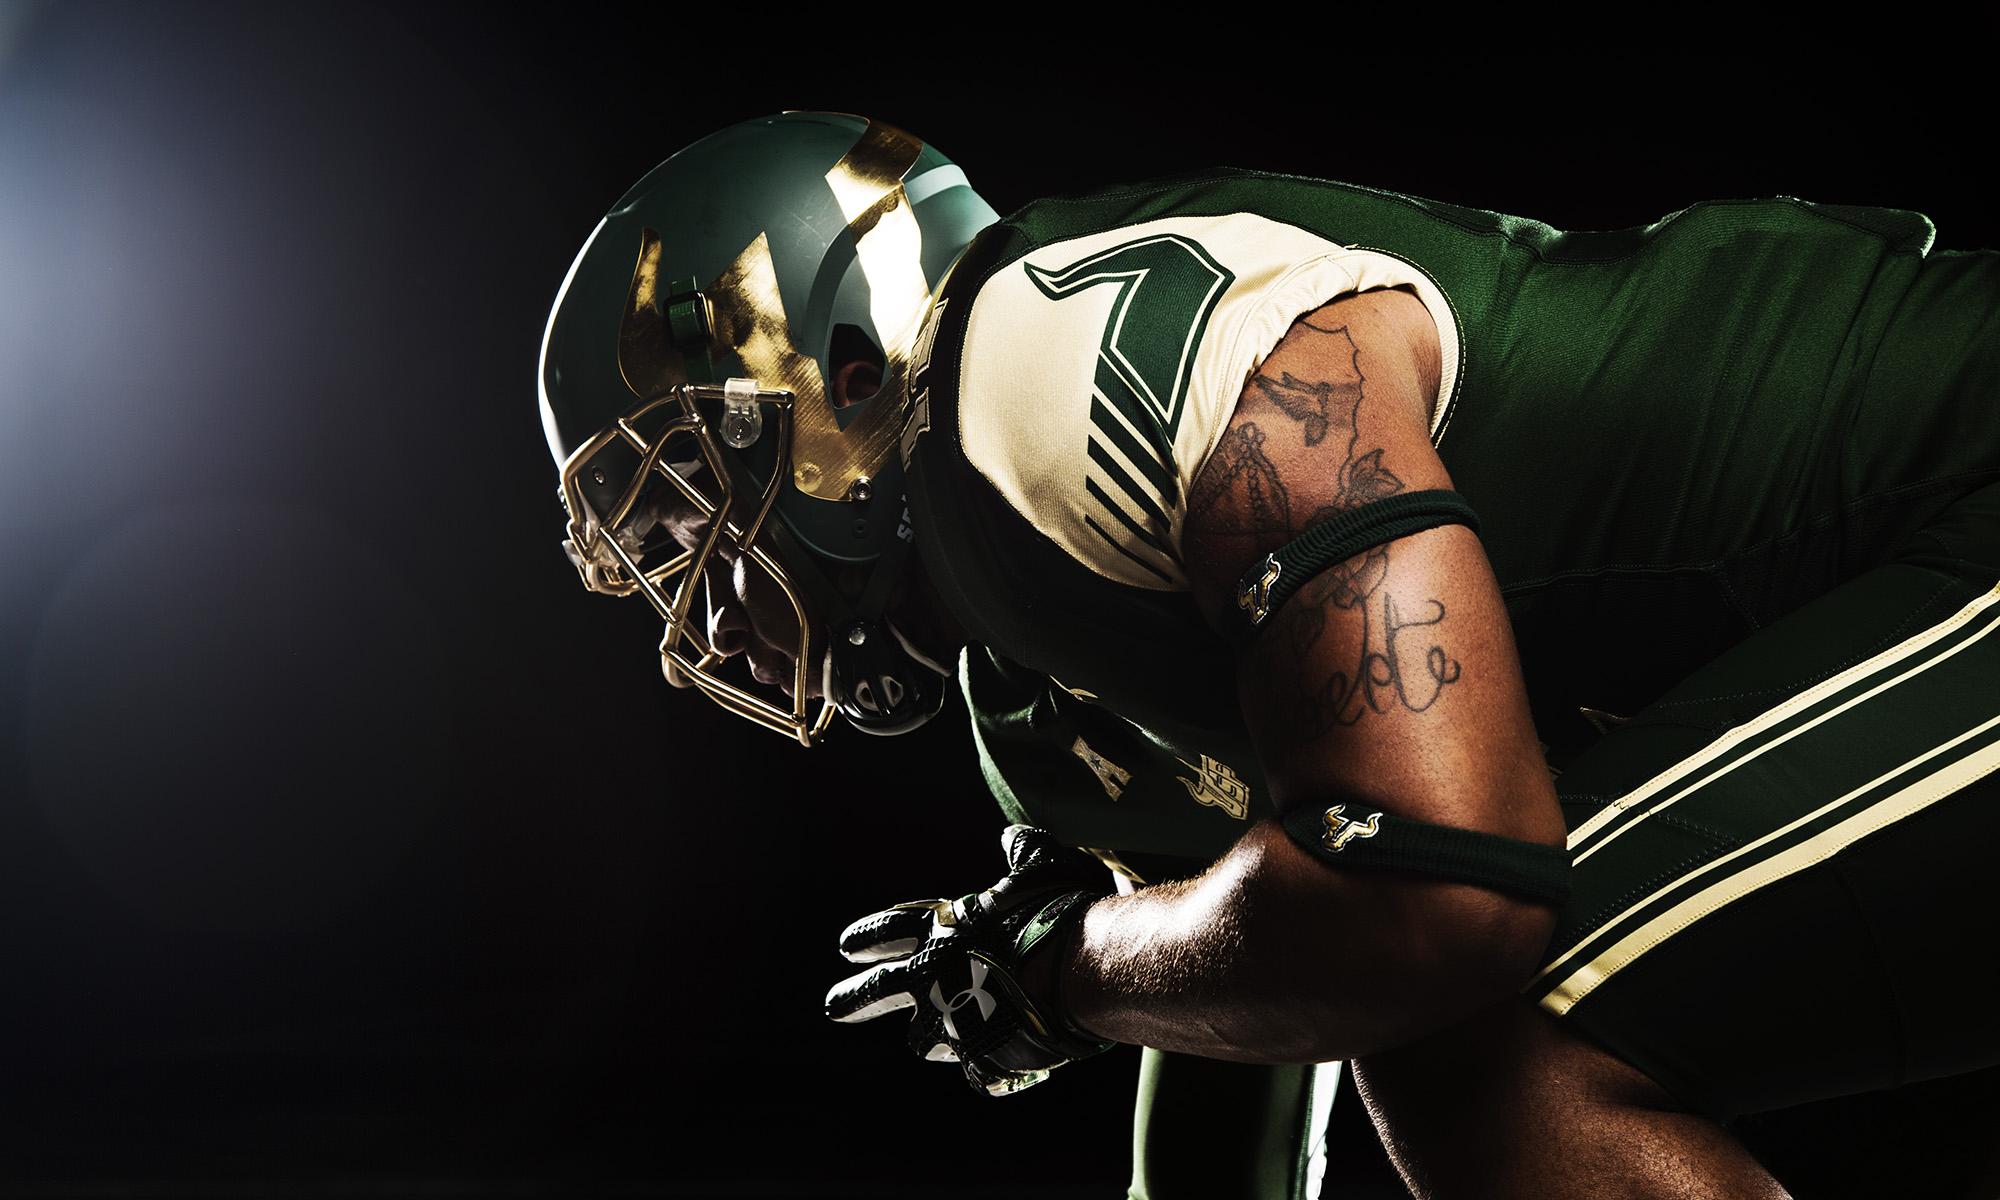 USF-Football-Green-261